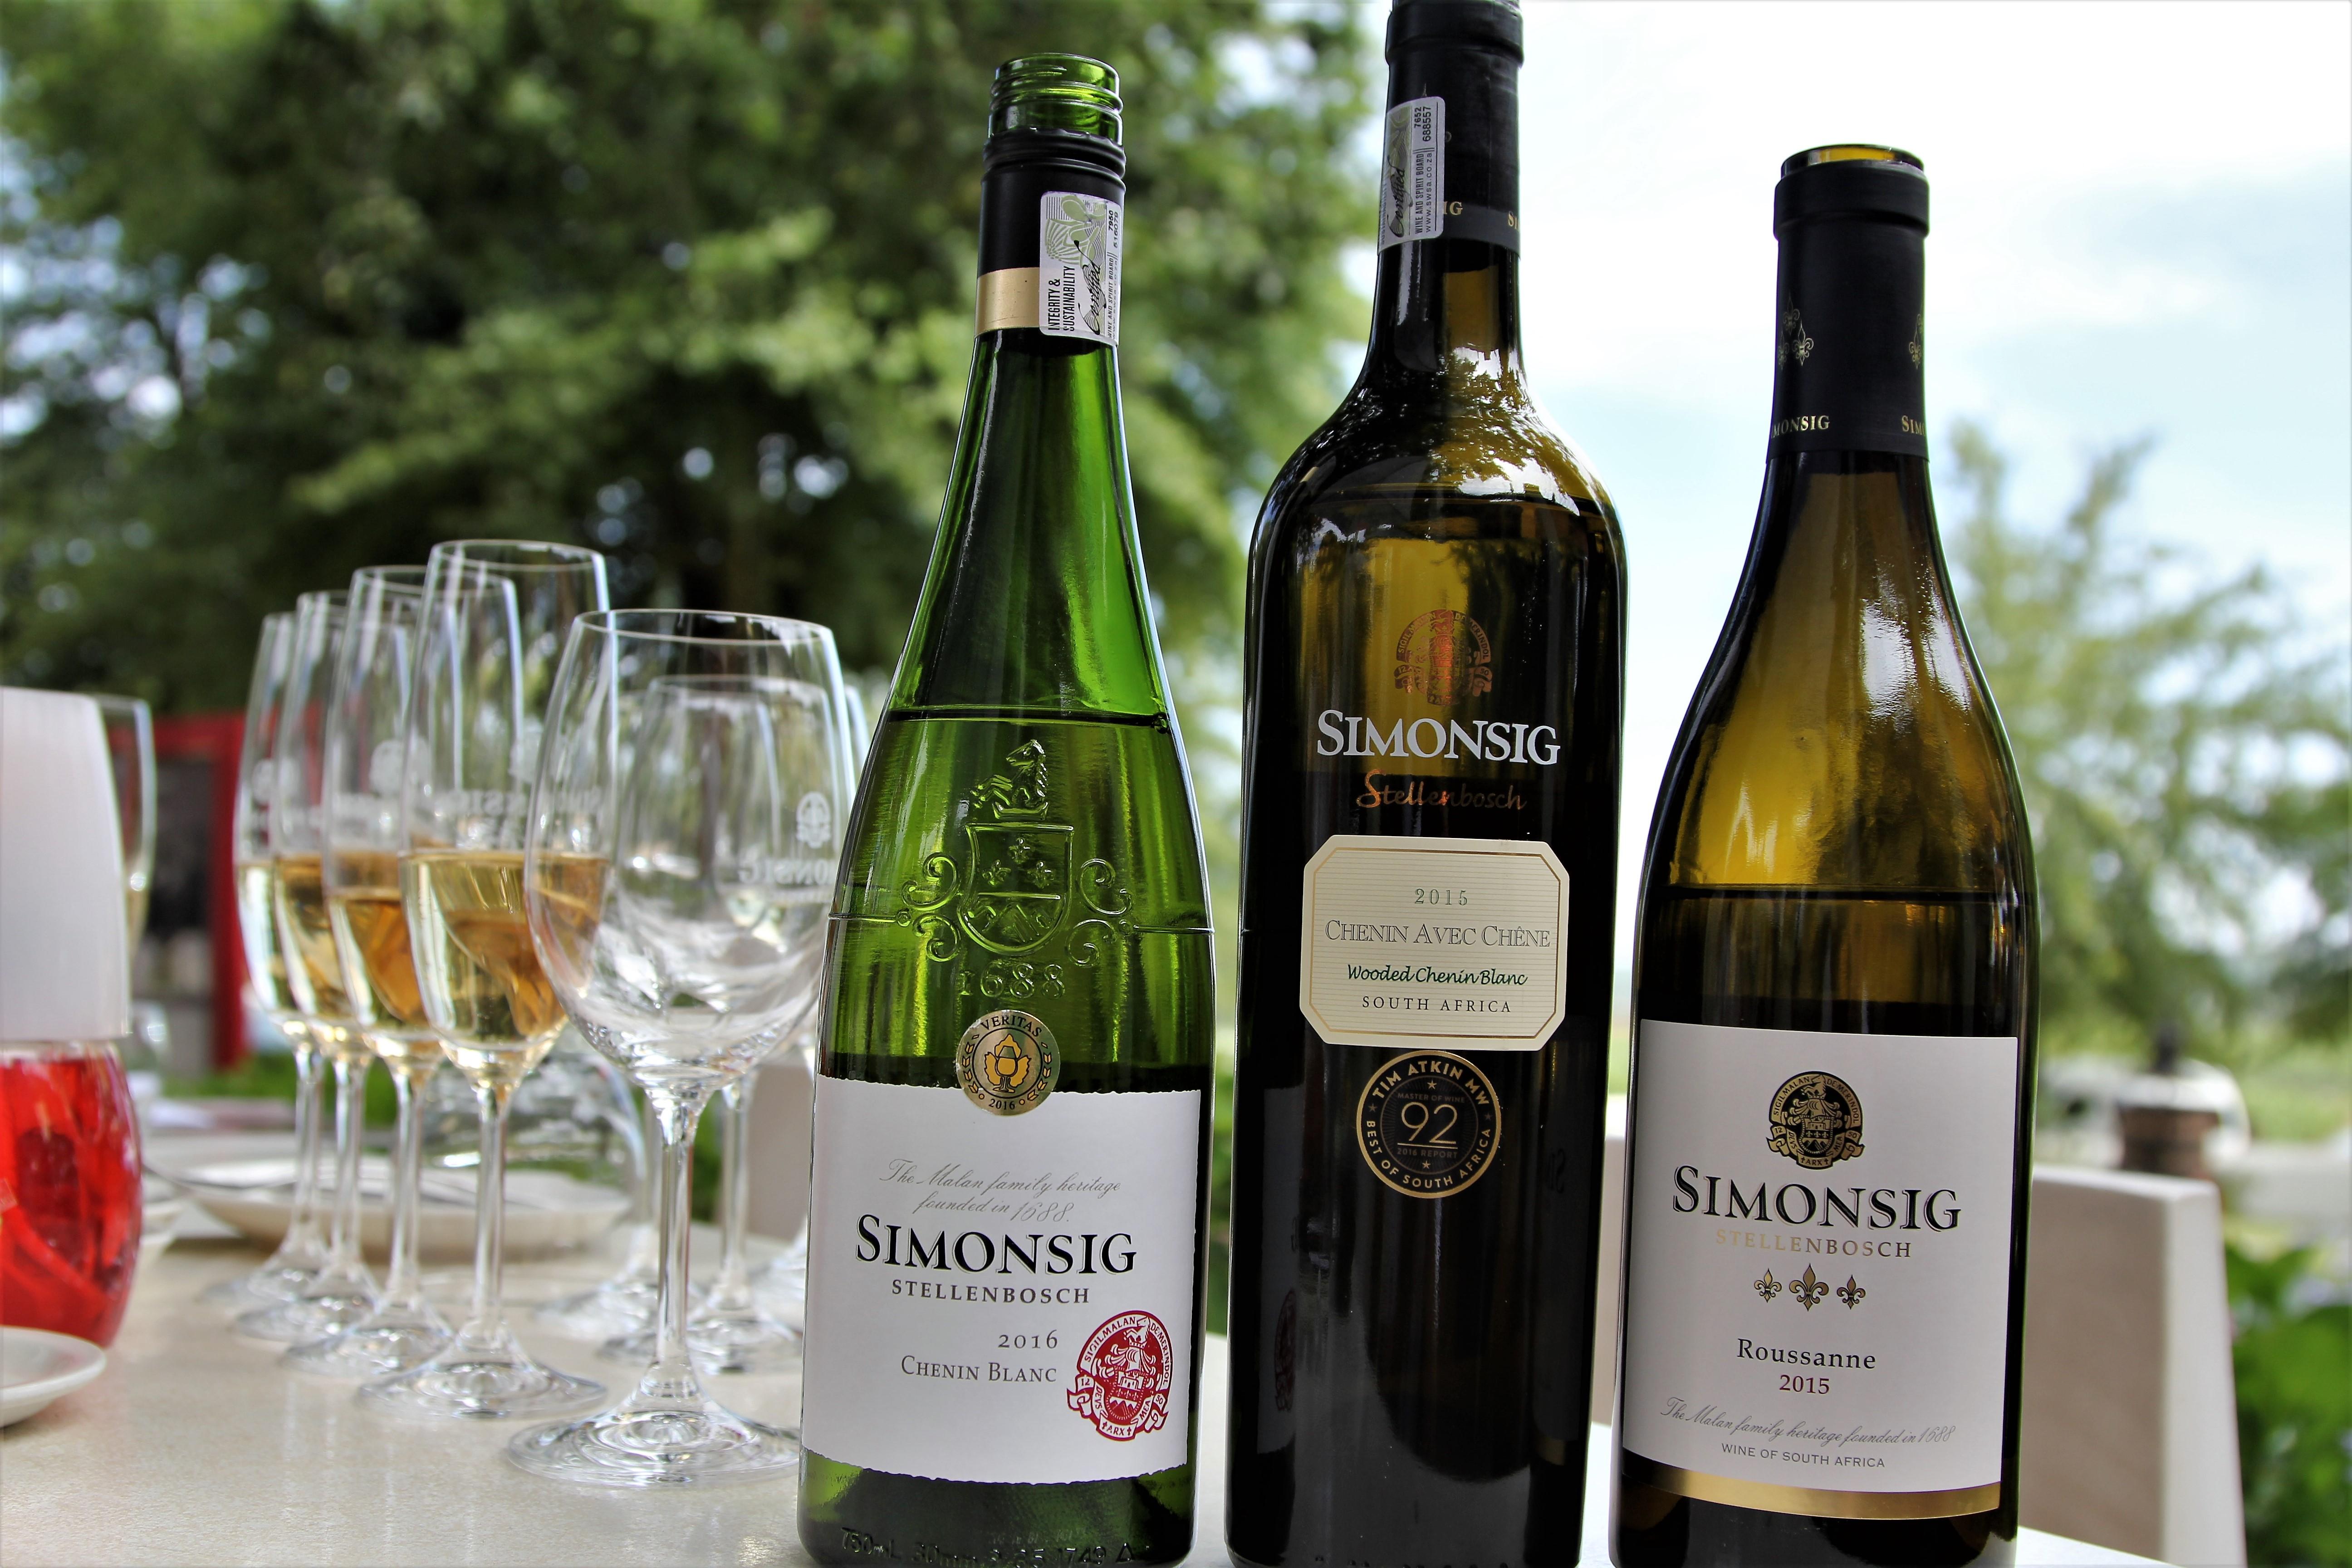 Simonsig vineyard - Stellenbosch